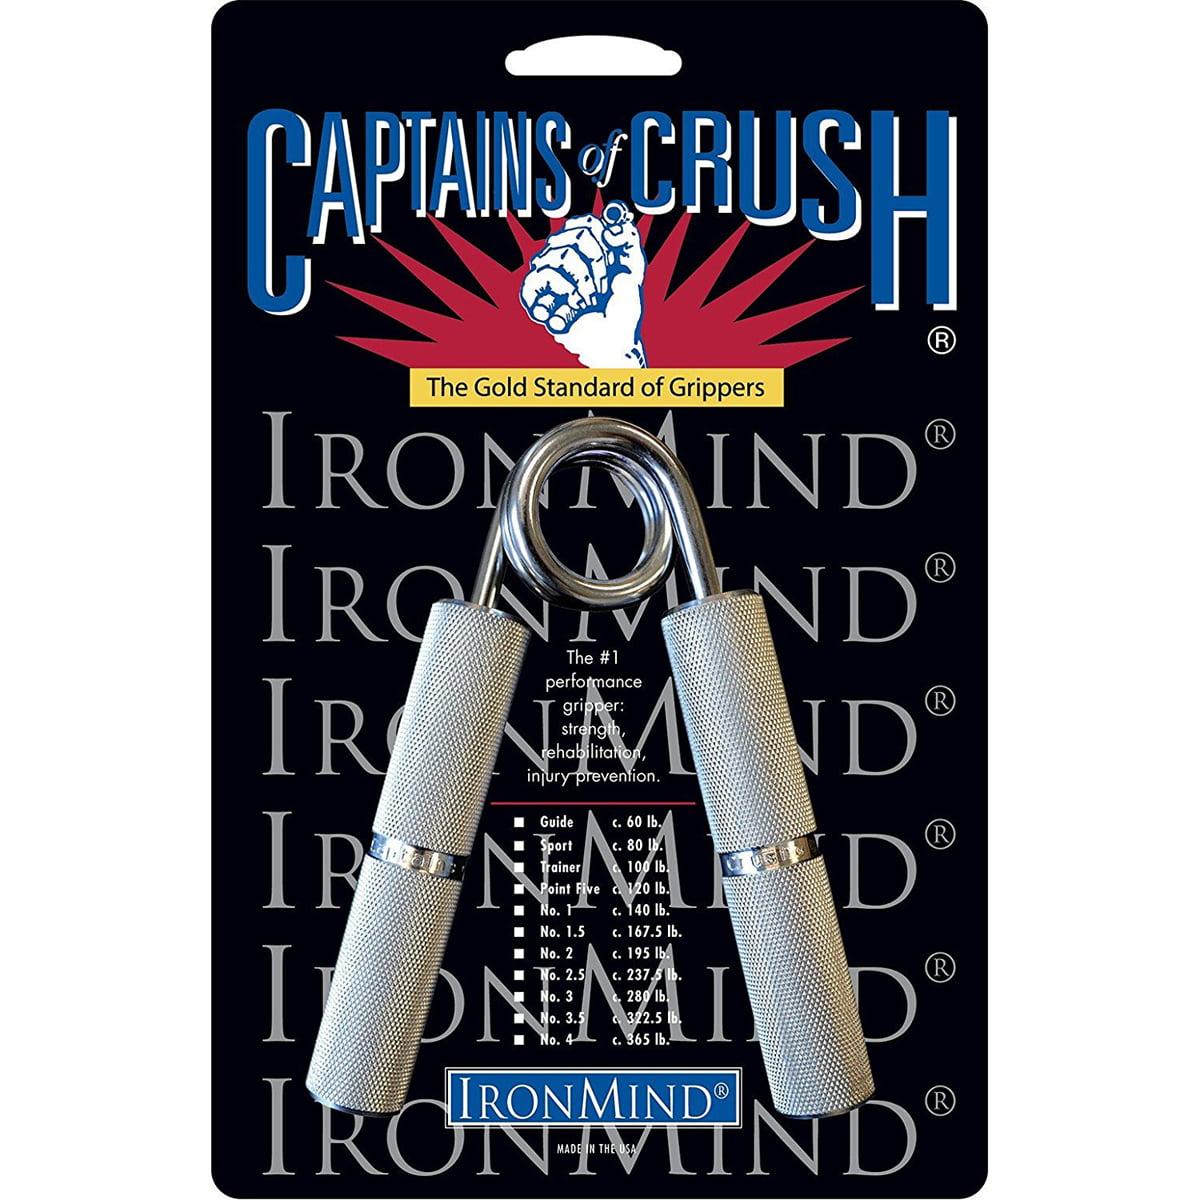 Captains of Crush Hand Gripper No. 3 - (280 lb)